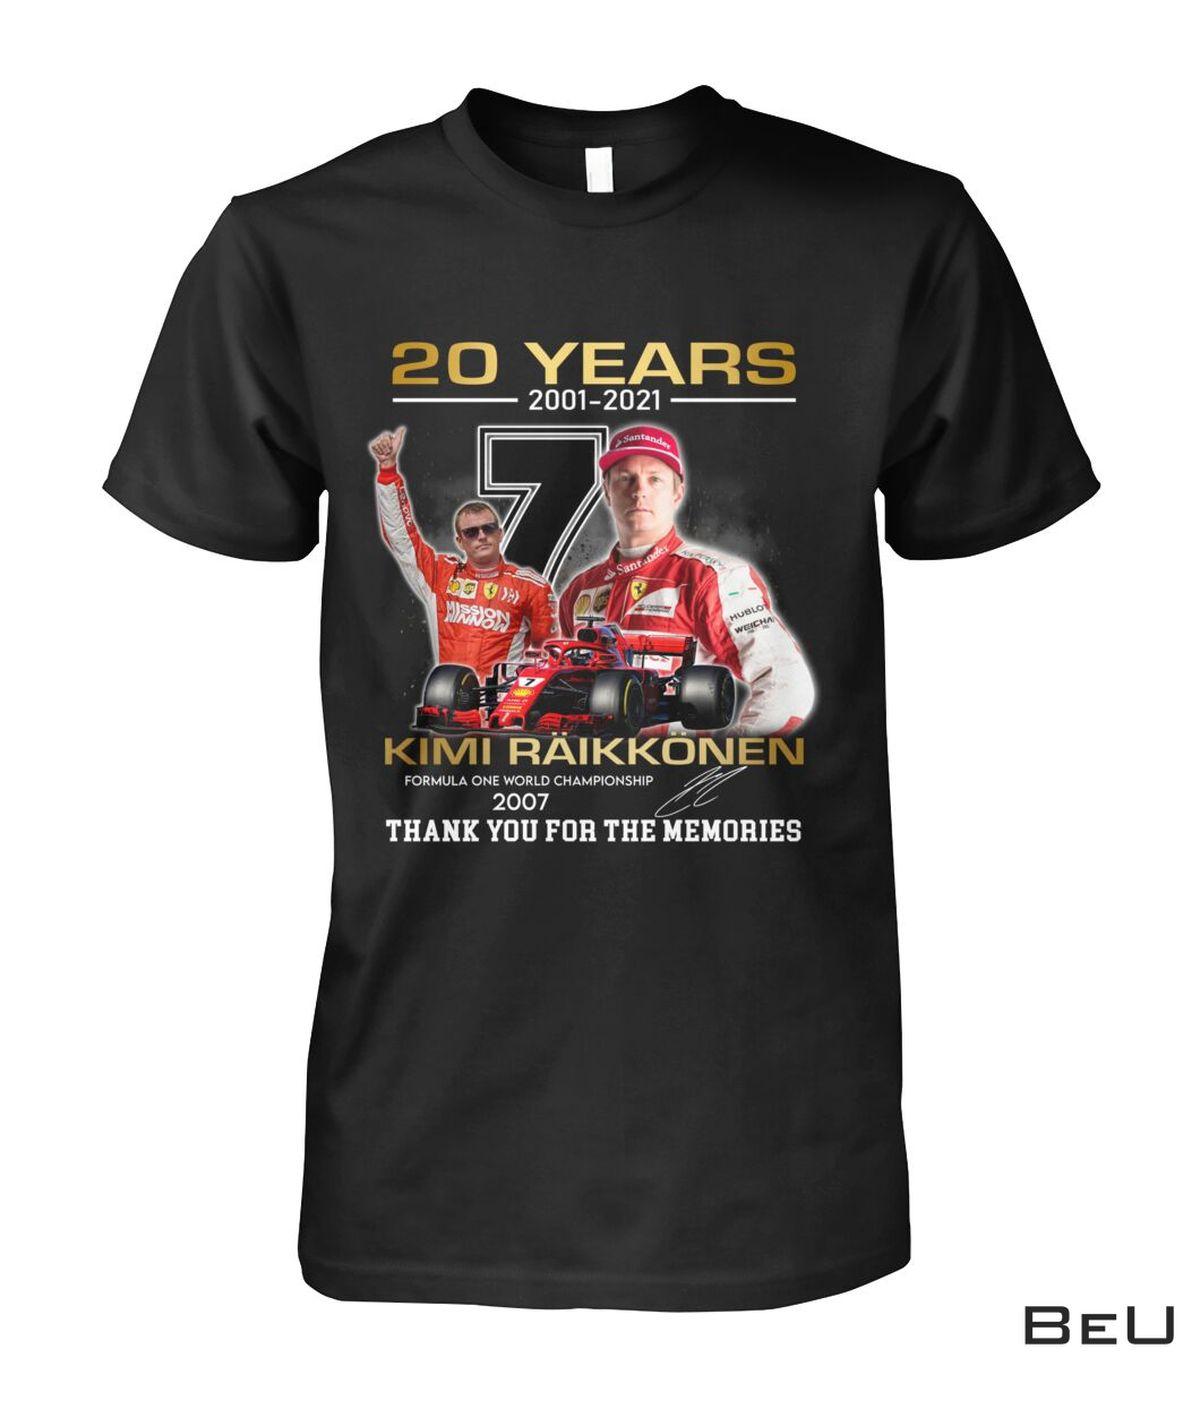 Kimi Raikkonen Formula One World Champion 2007 Shirt, hoodie, tank top